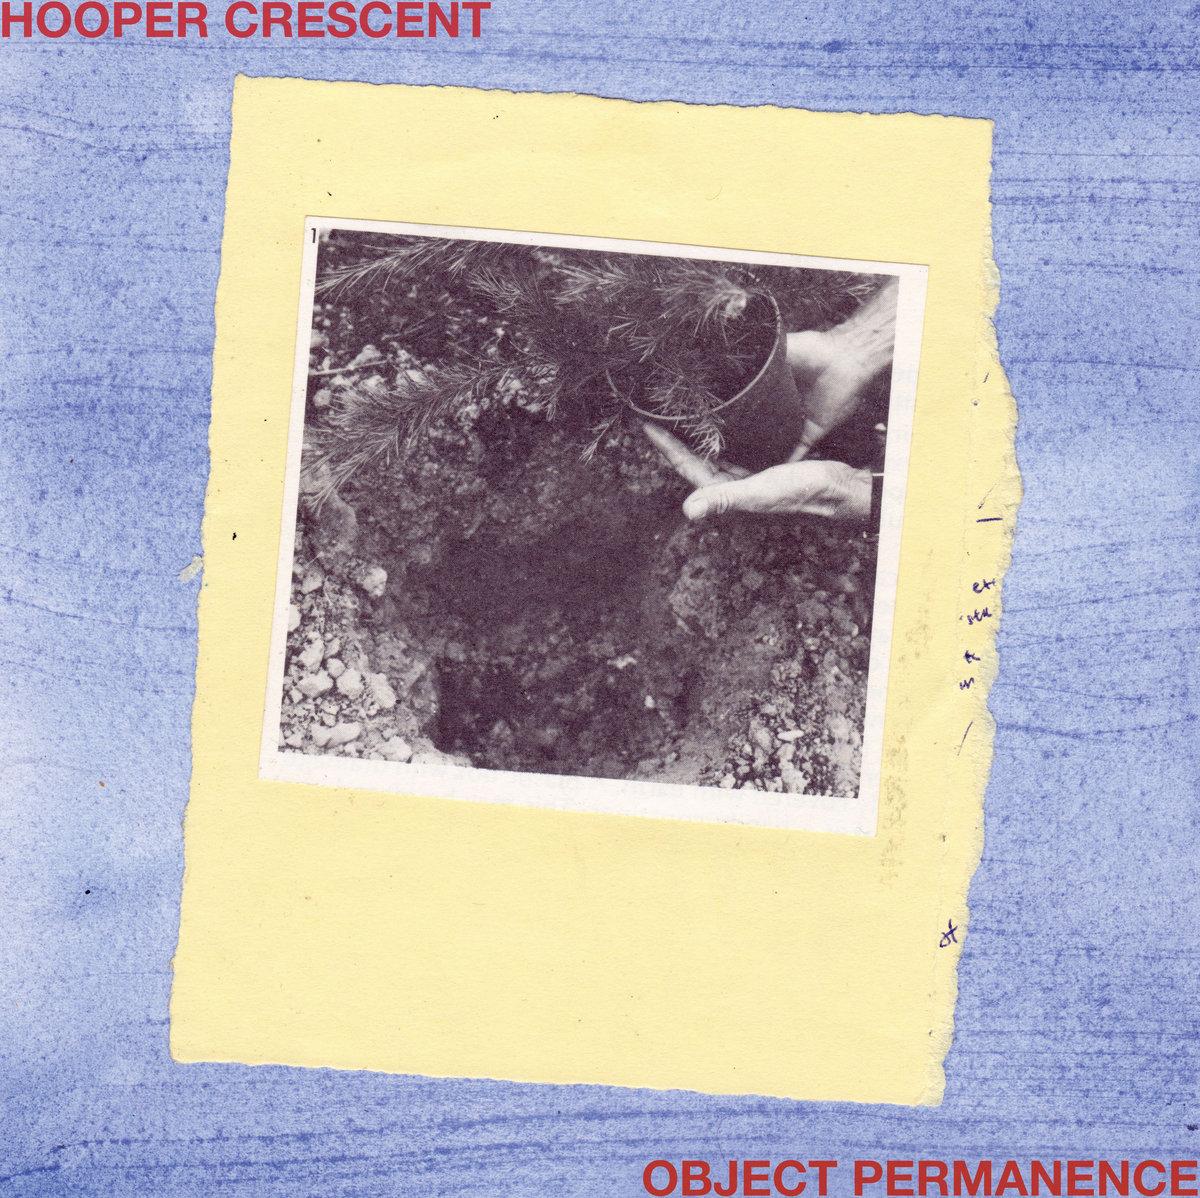 Hooper Crescent - Object Permanence